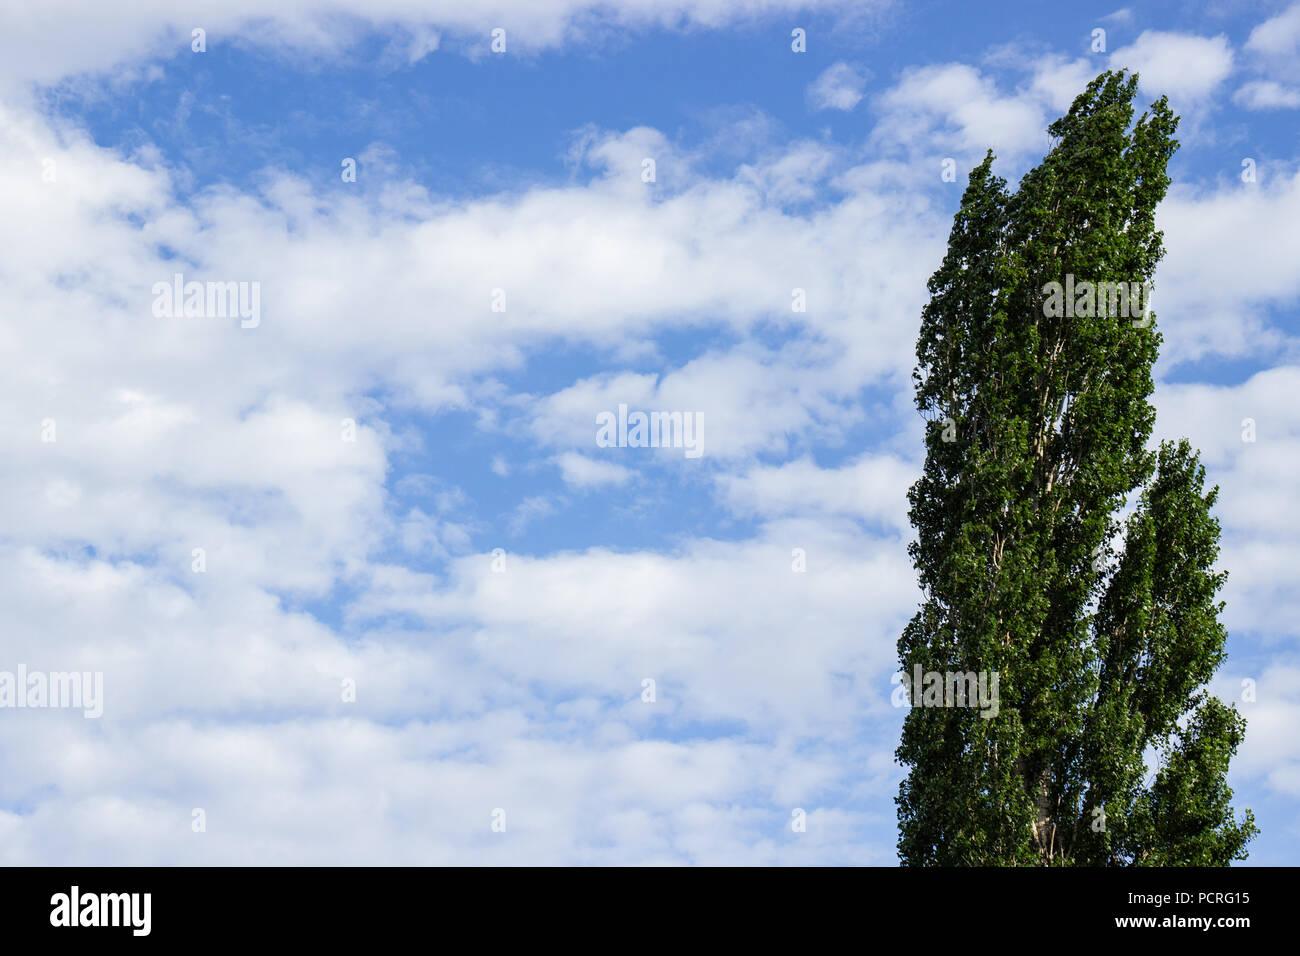 Big tree, wind, blue sky , white clound. - Stock Image